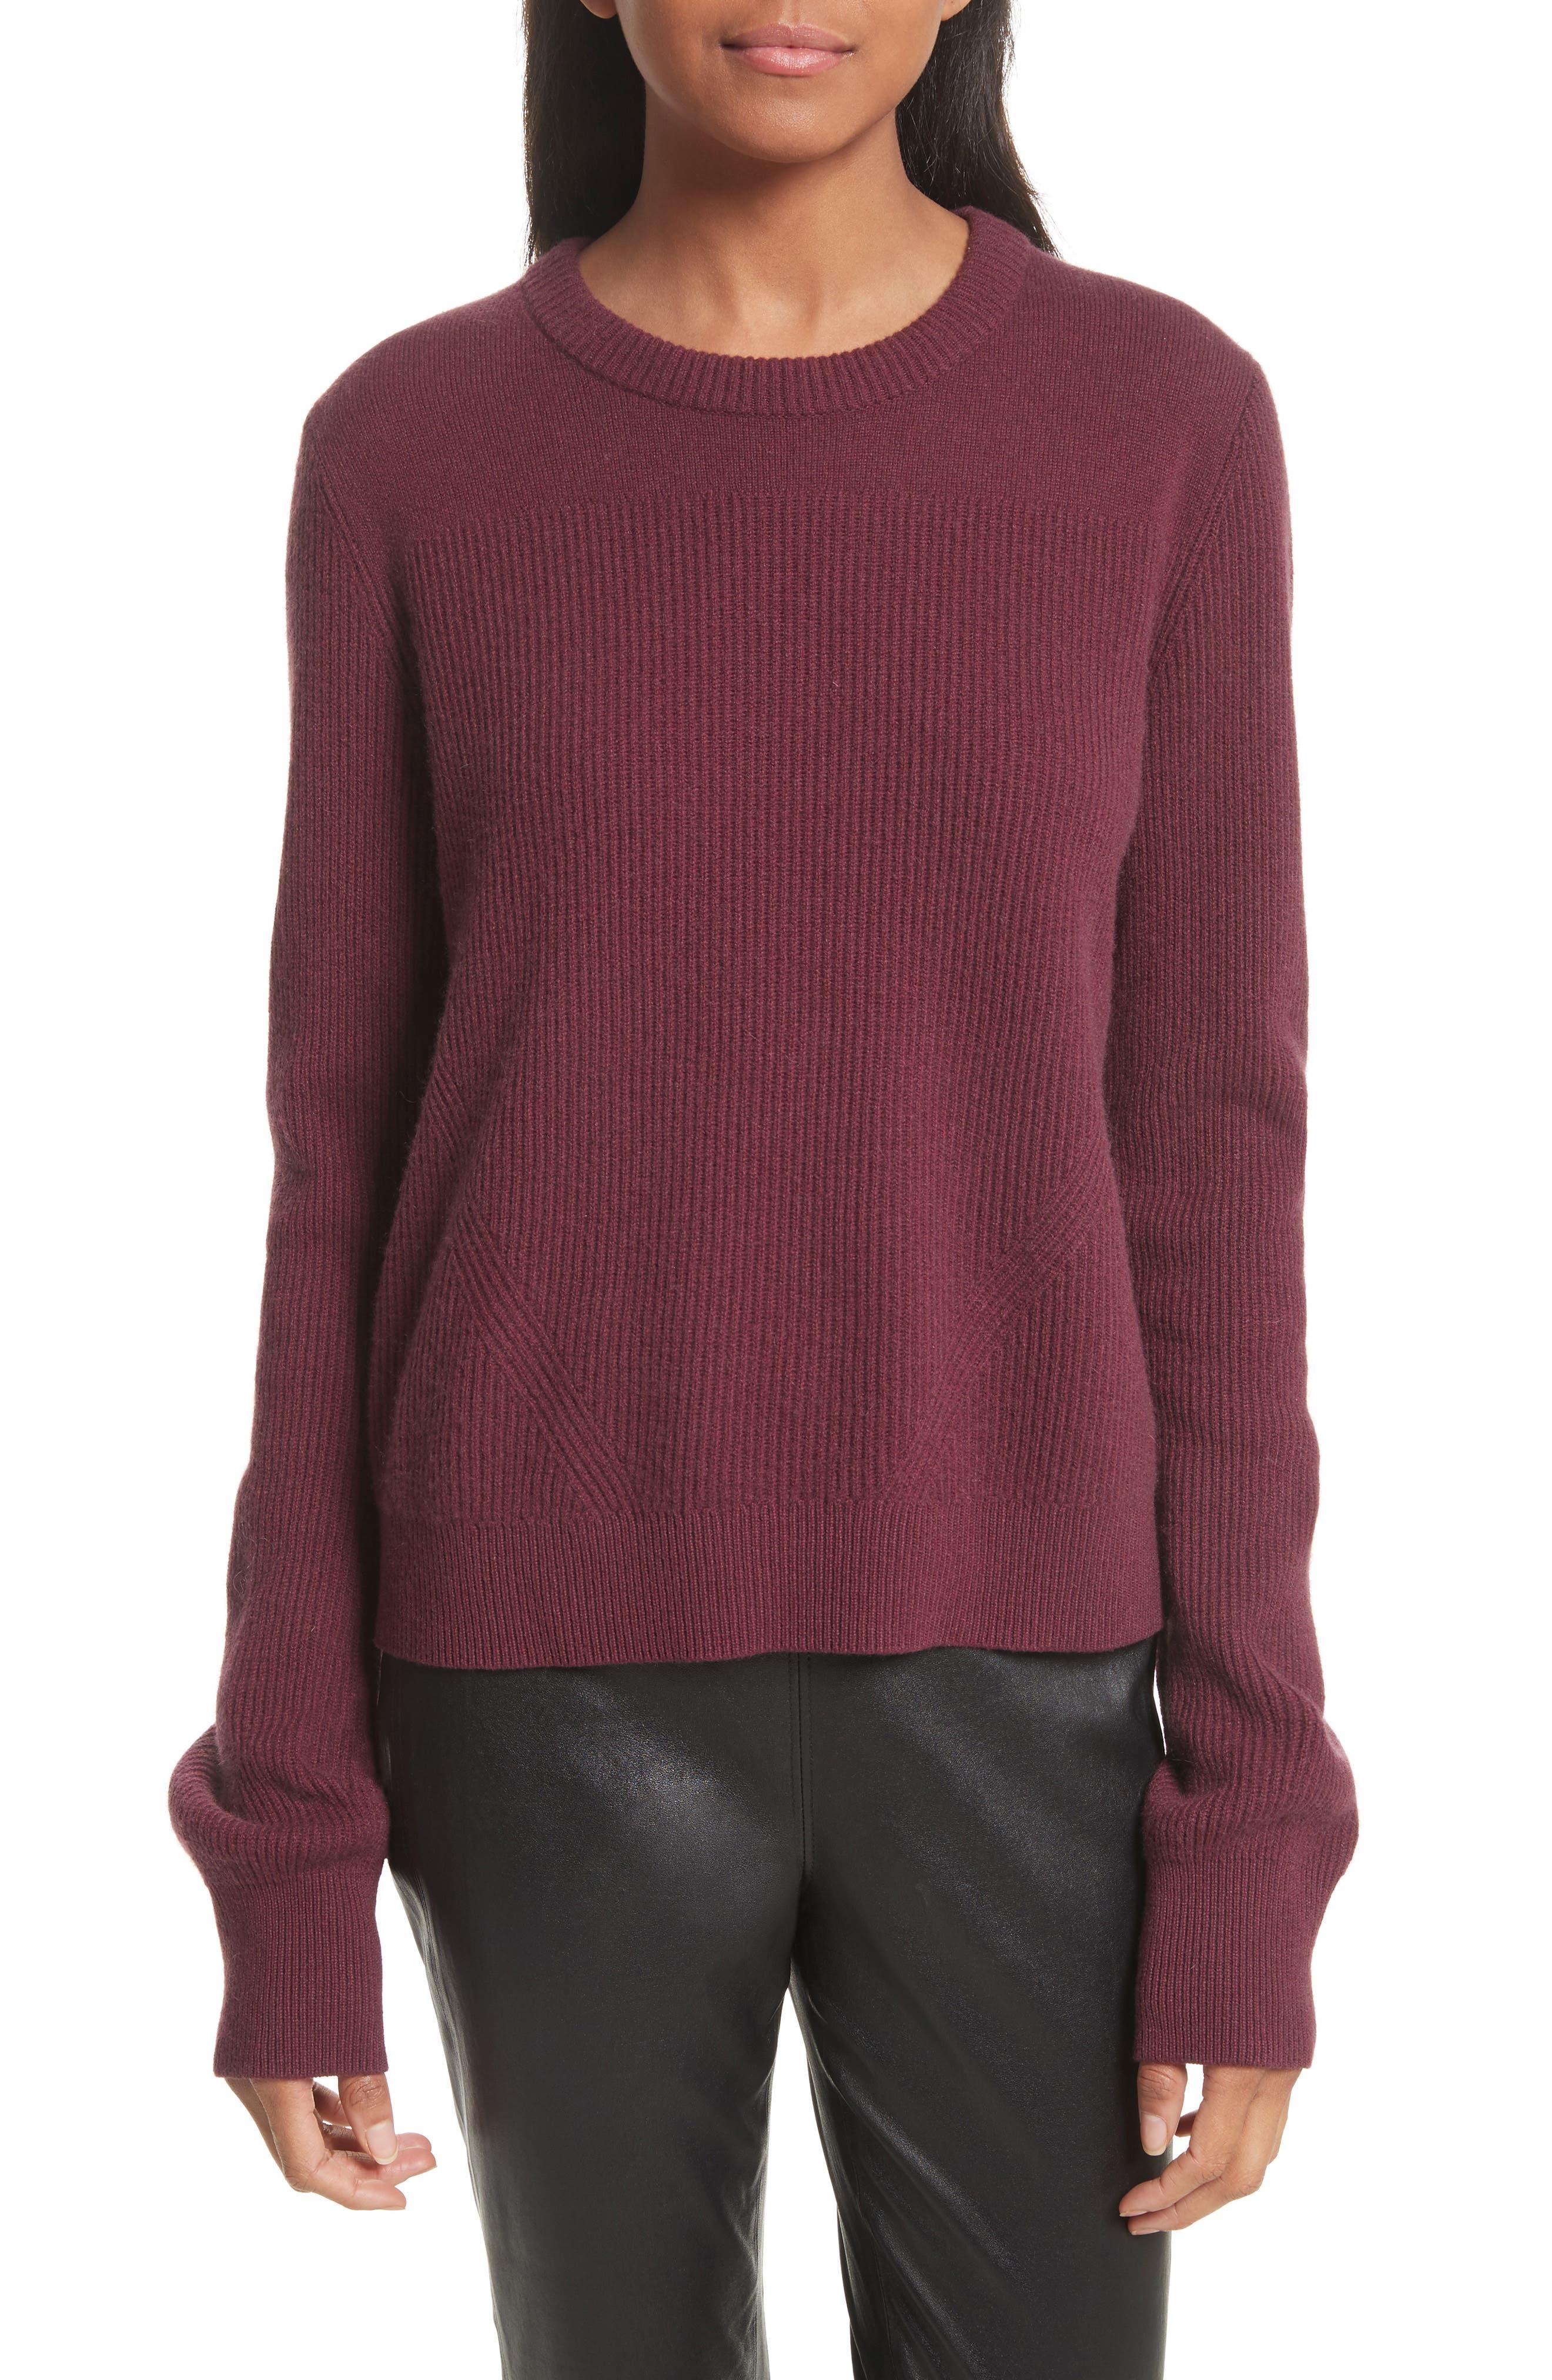 Alternate Image 1 Selected - rag & bone Ace Cashmere Crop Sweater